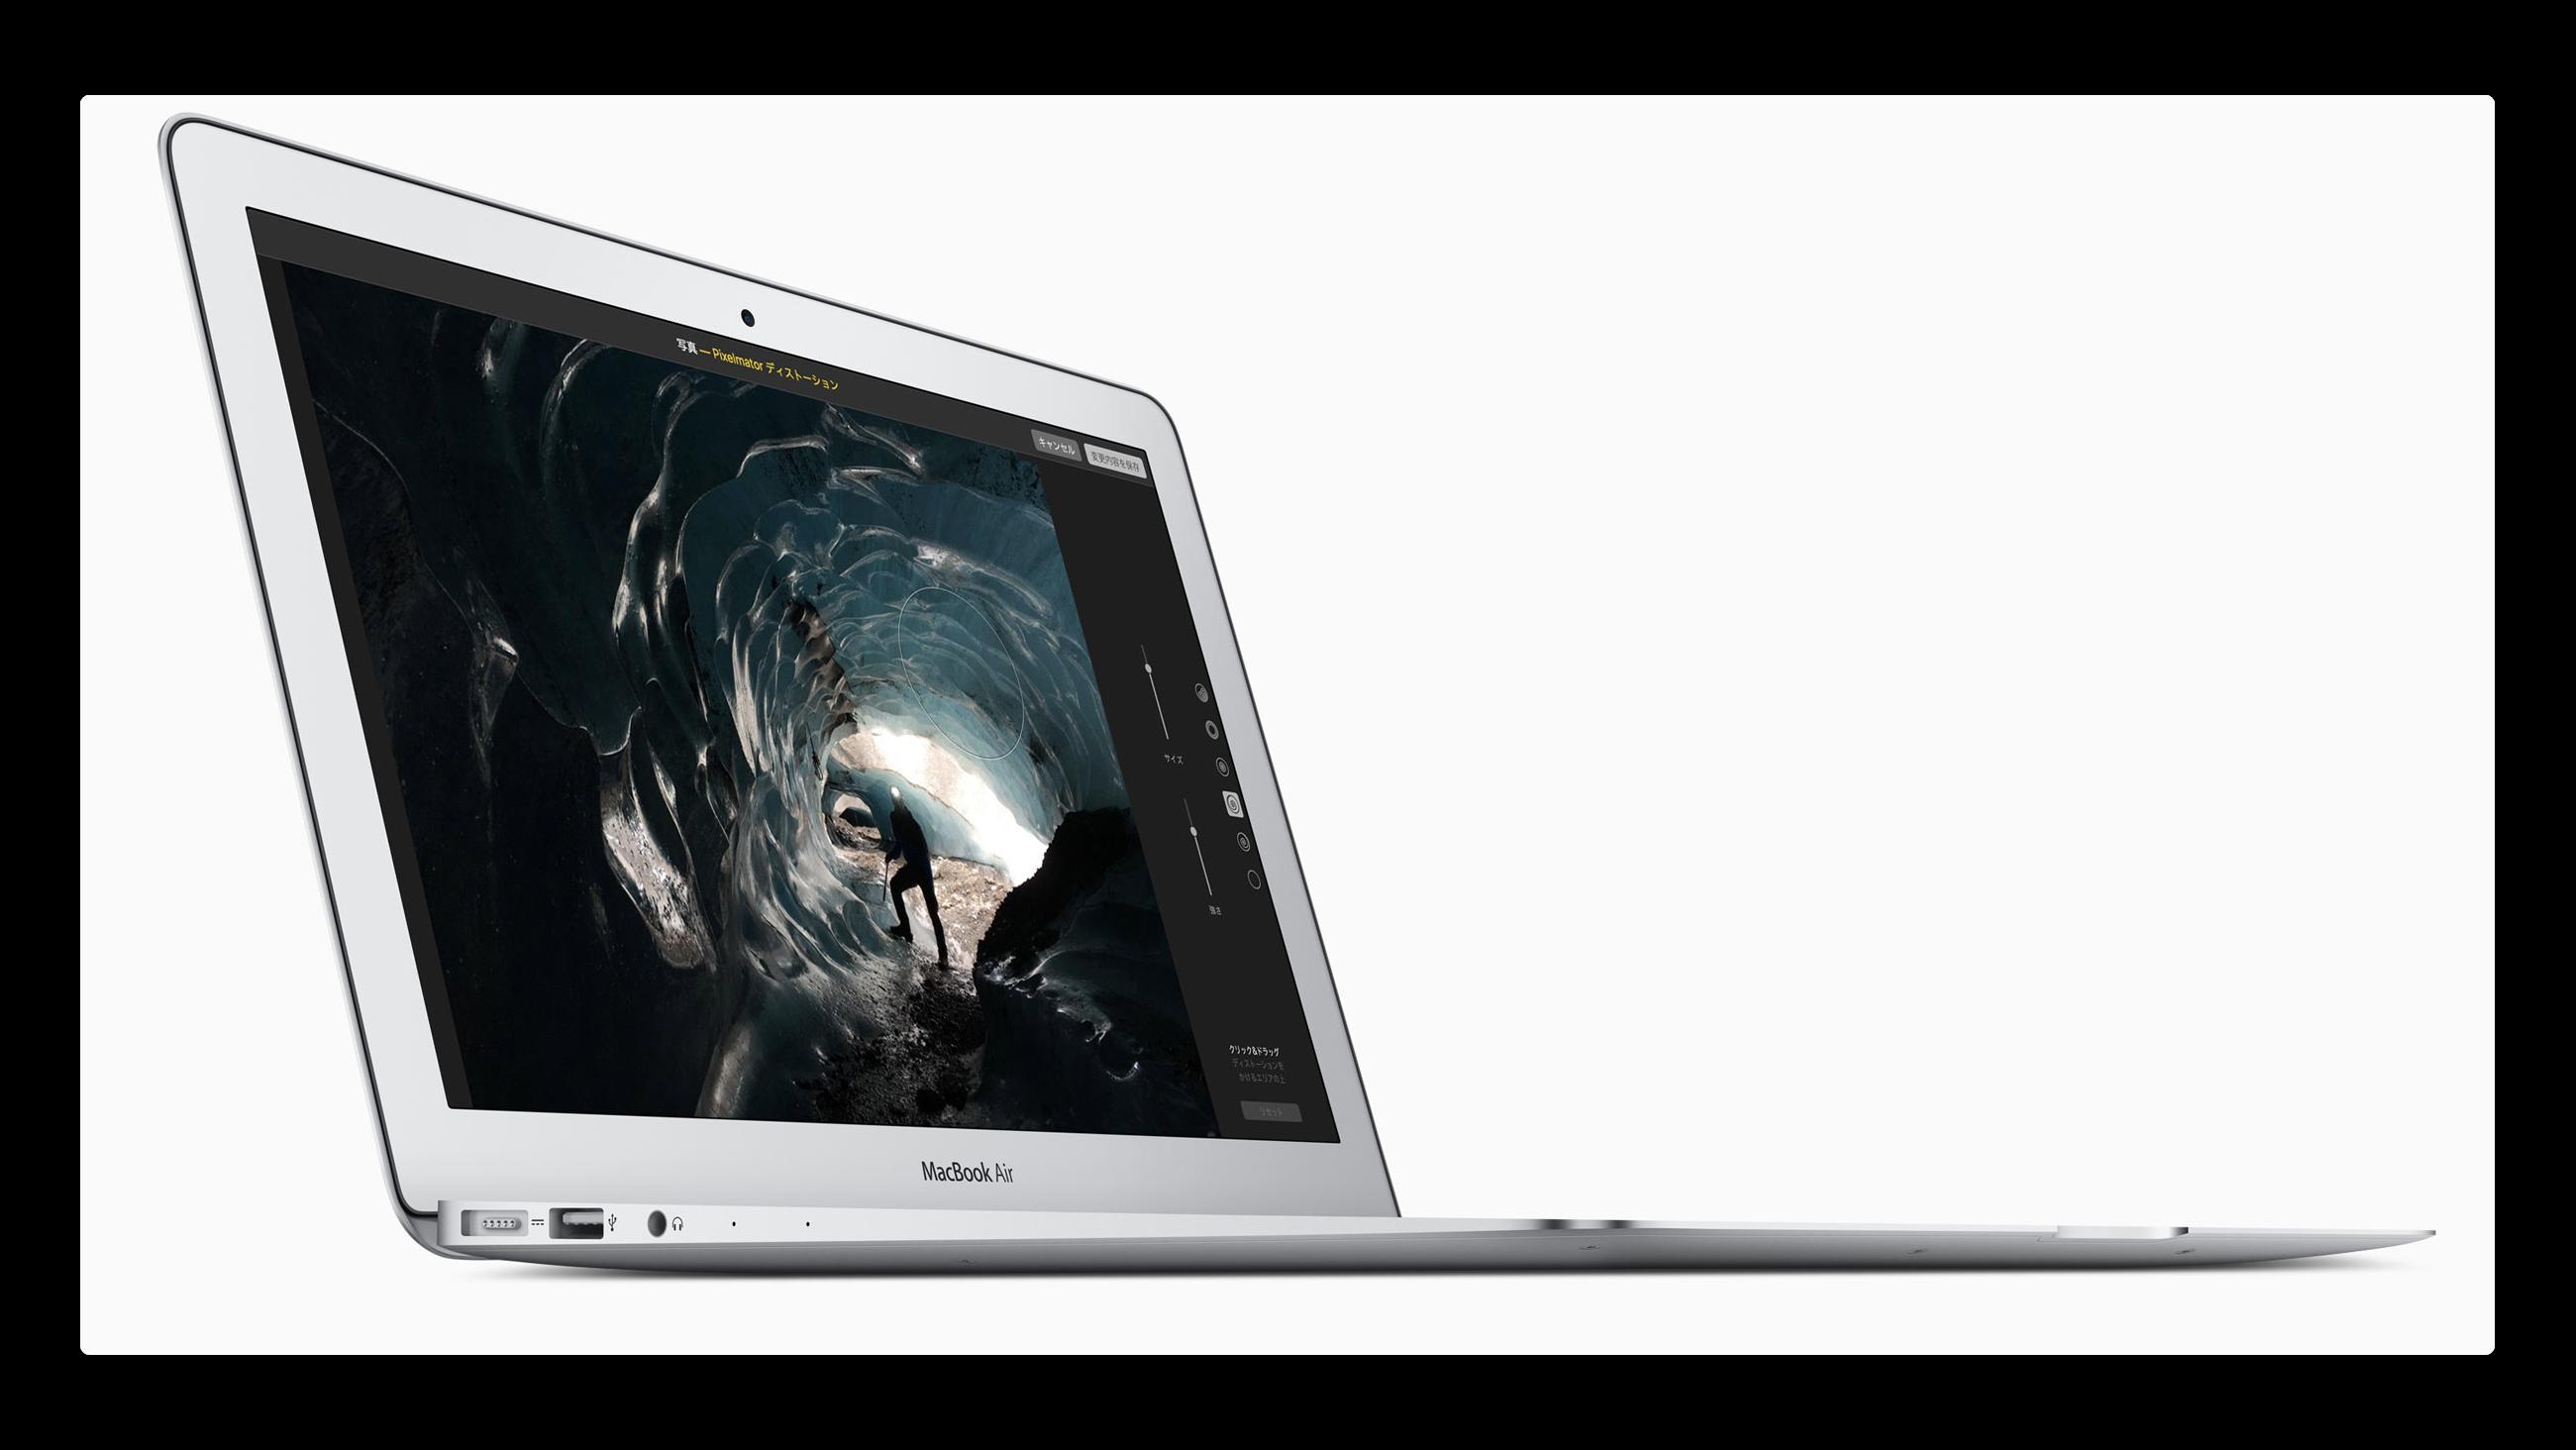 【Mac】無料のデータ復旧ソフトウェア「Mac Data Recovery Wizard for Mac」